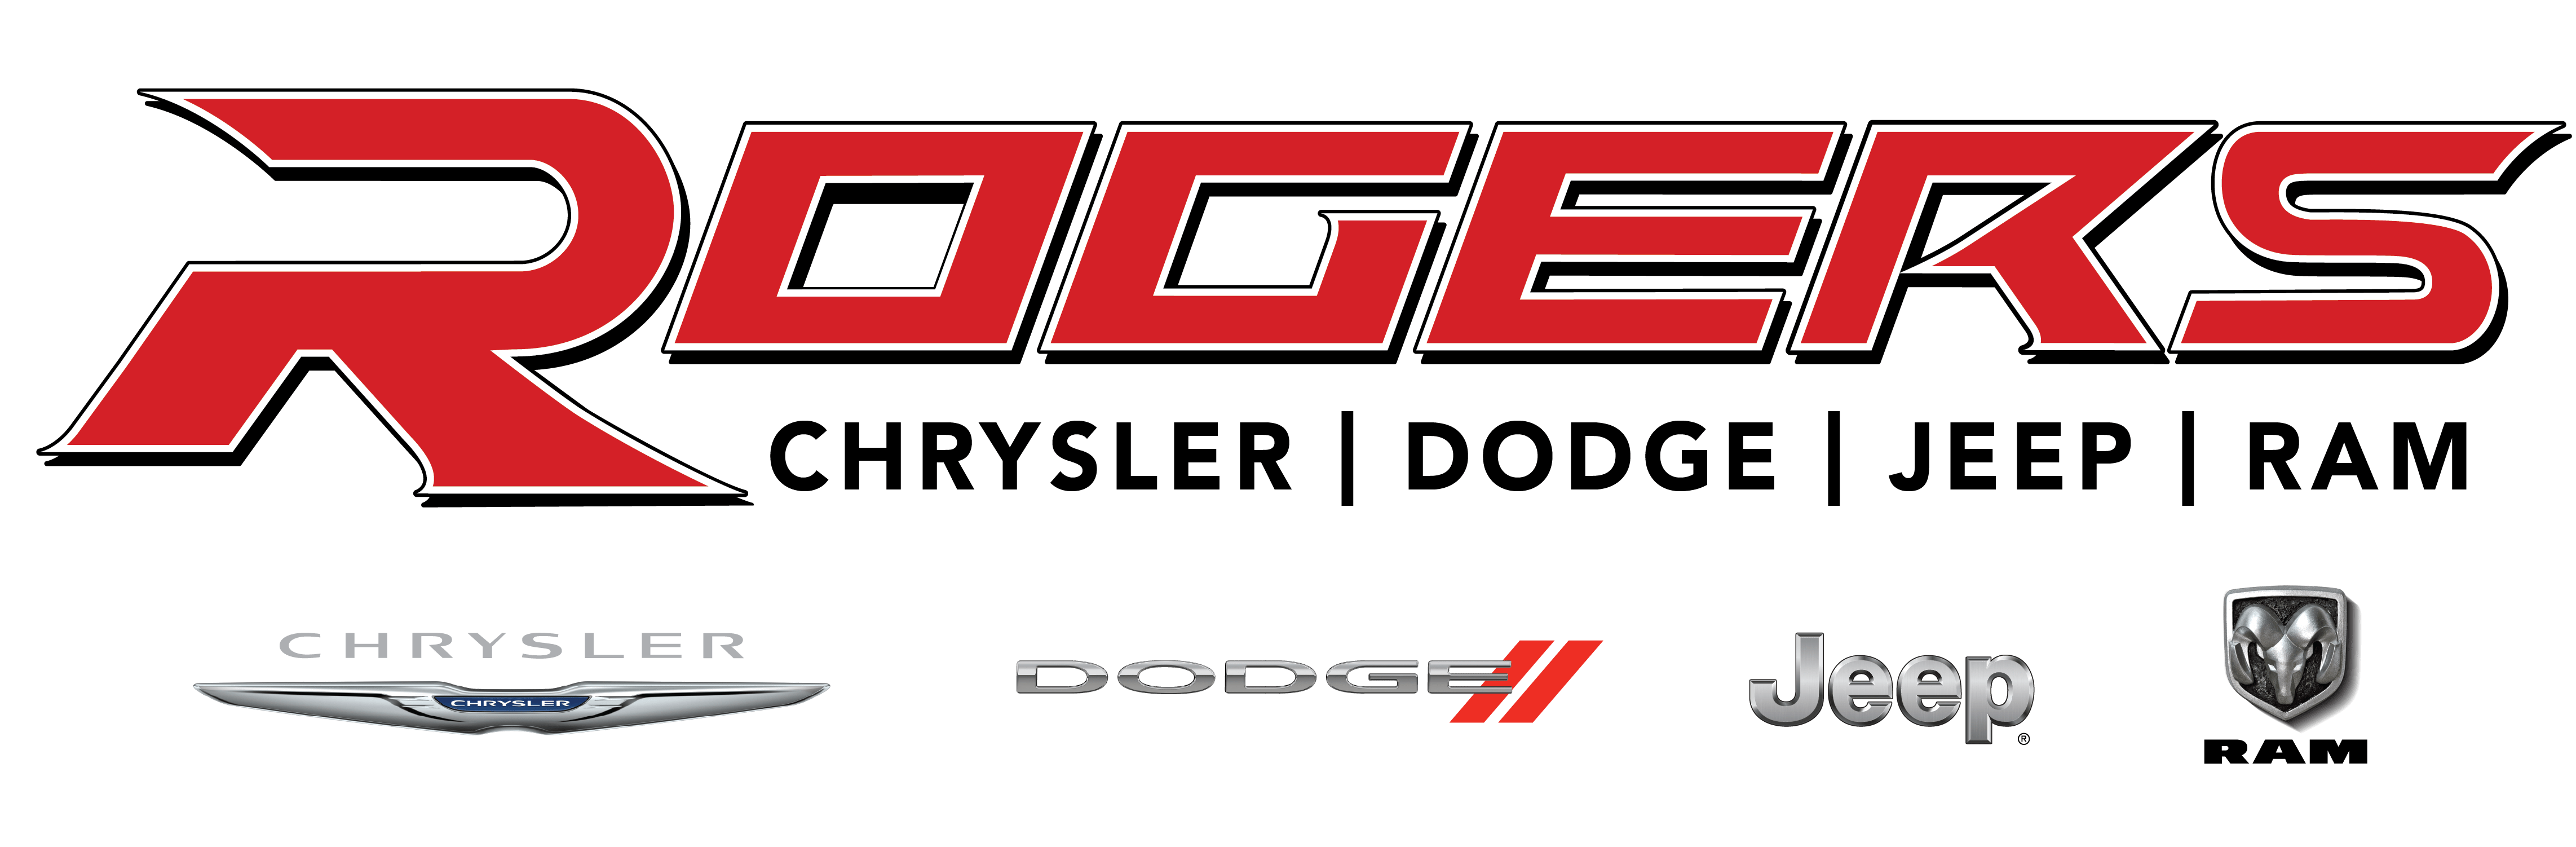 RM_rogers_logos_main-07